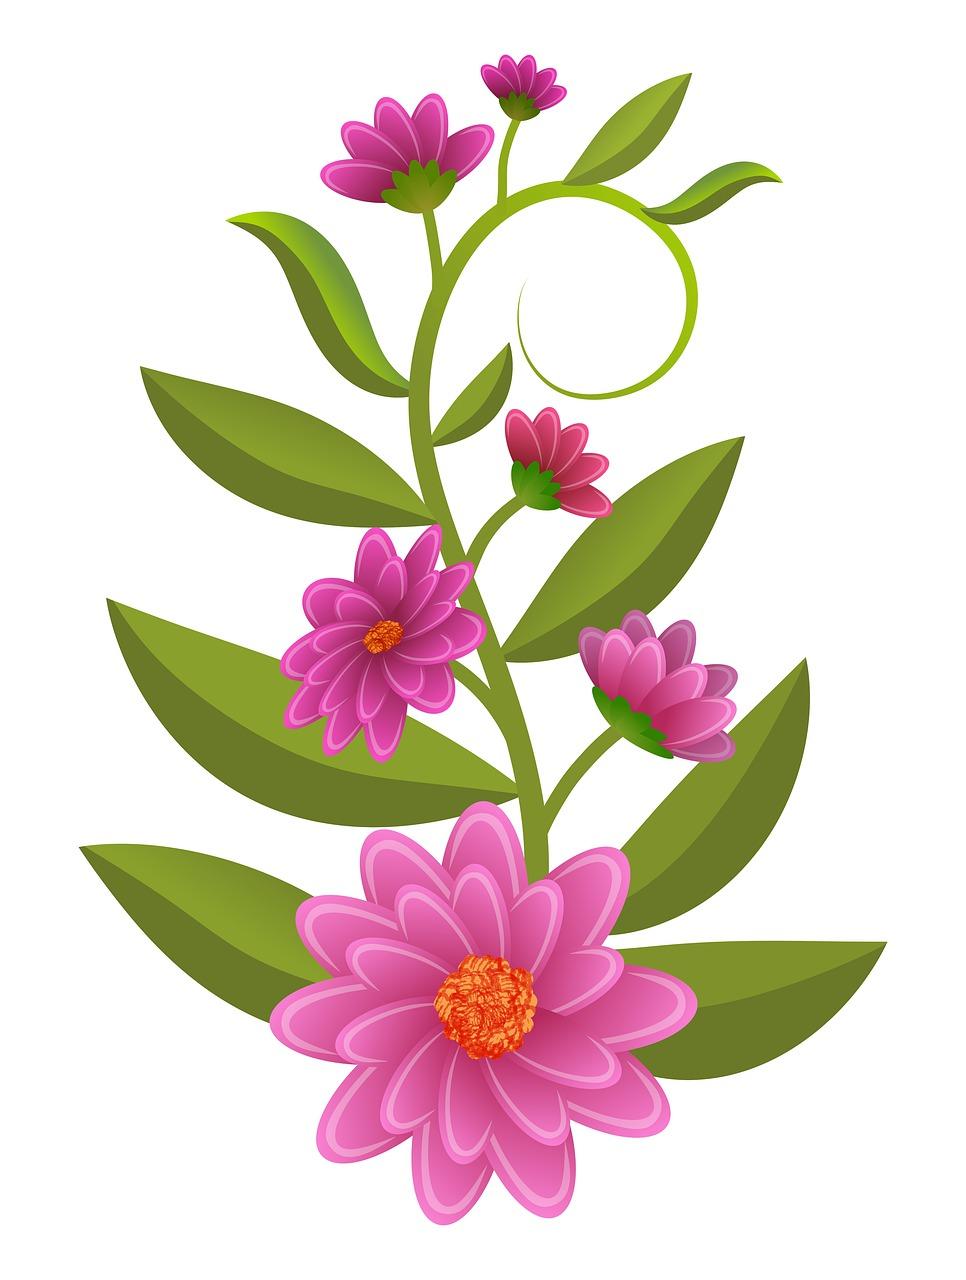 Bunga Ilustrasi Buket Gambar Gratis Di Pixabay